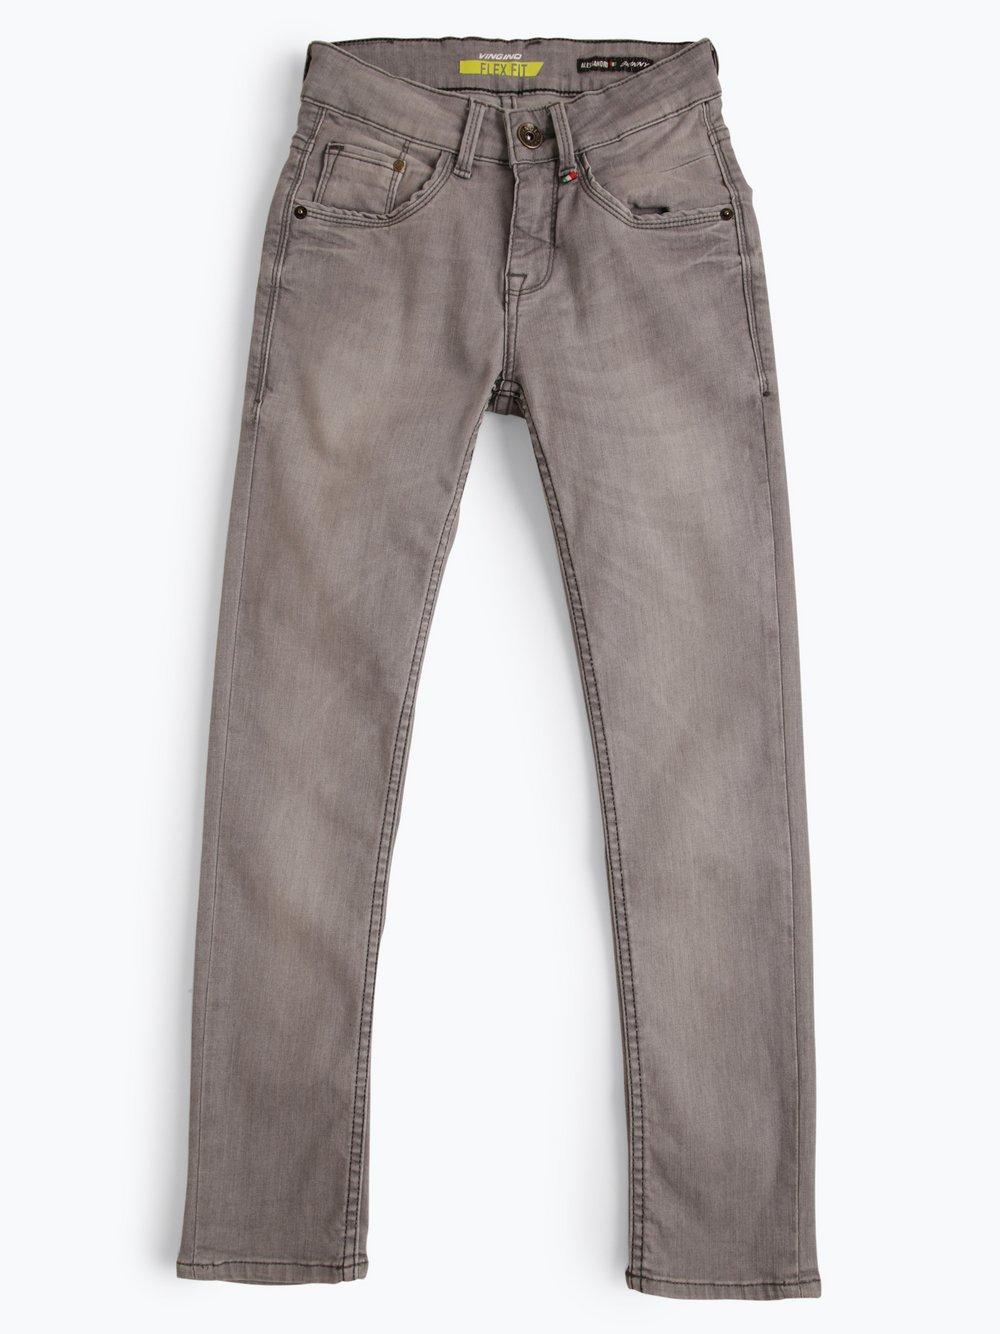 2cf5e9d2599cc Vingino Jungen Jeans Skinny Fit - Alessandro online kaufen | PEEK ...